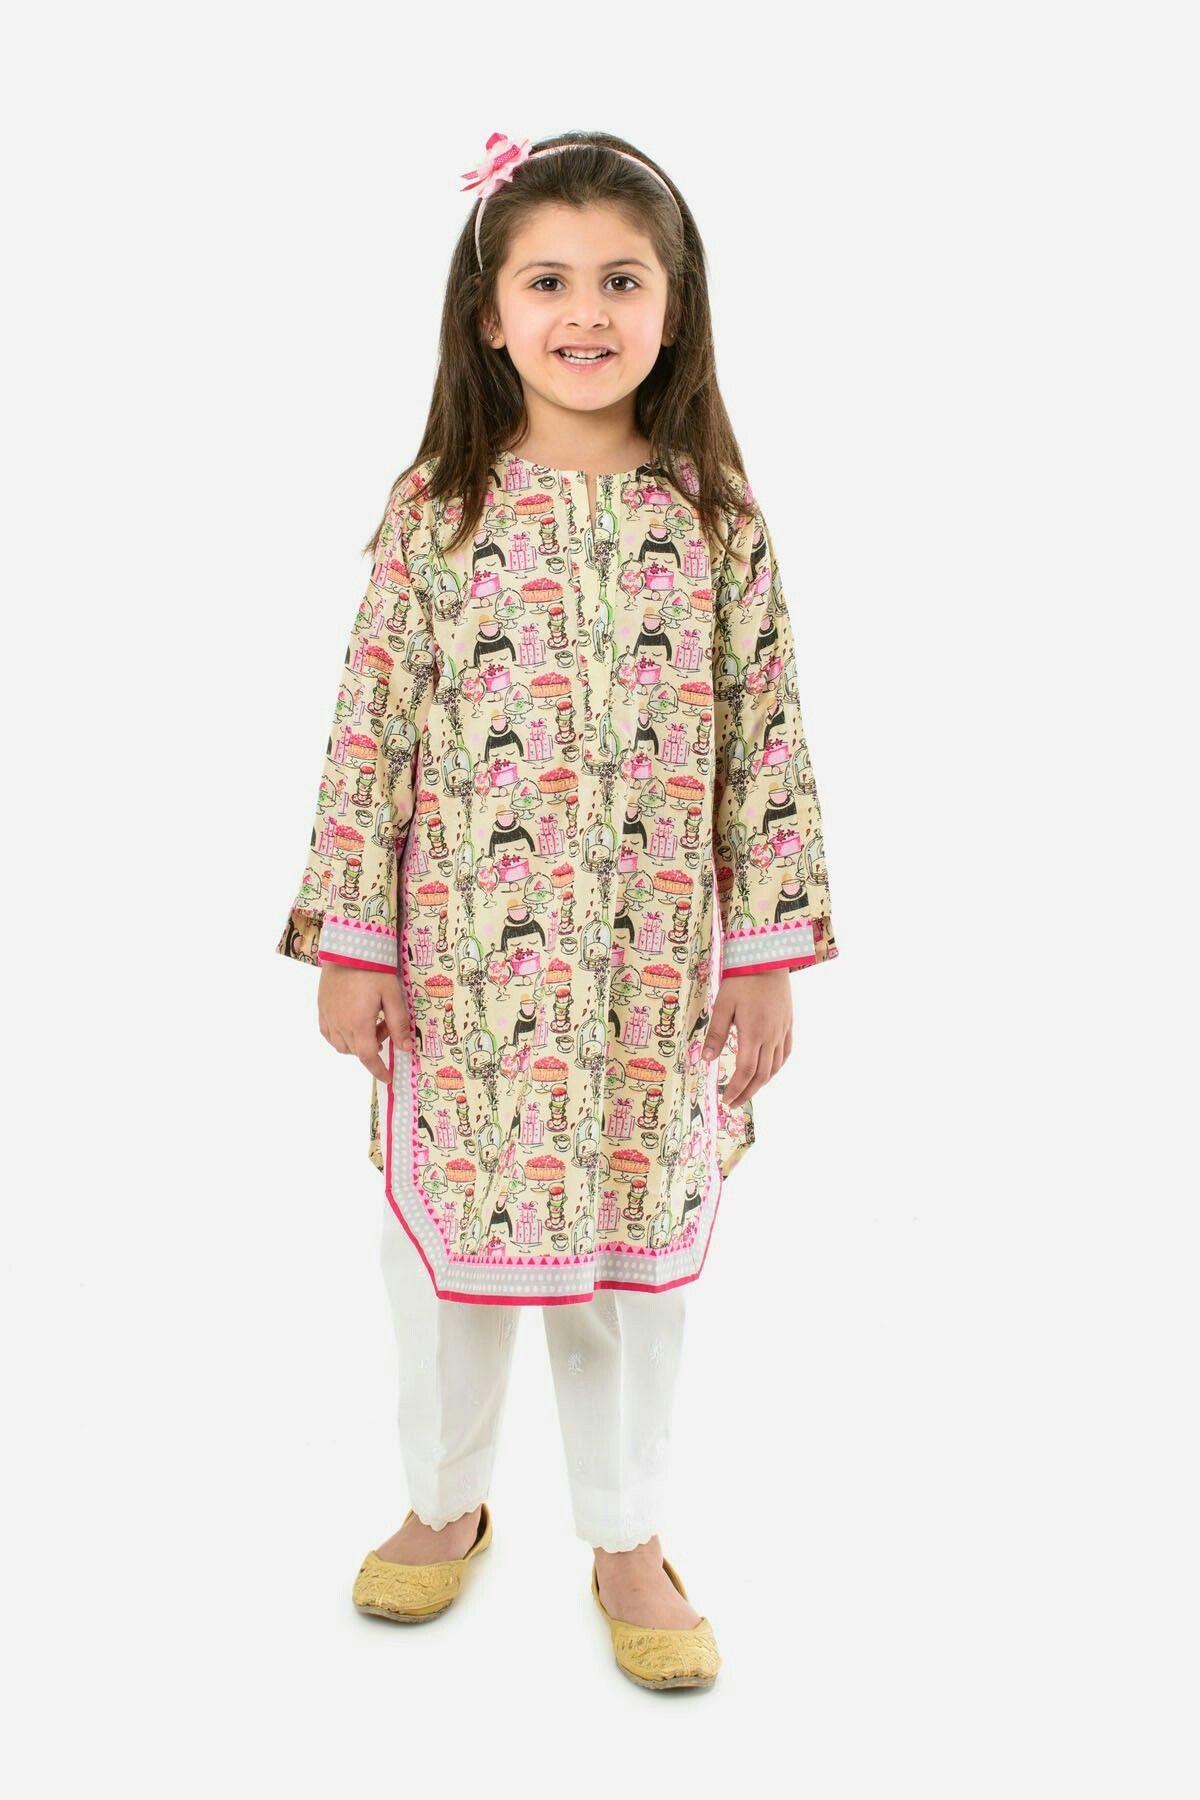 Khaadi kids pakistan | Little girl | Pinterest | Kids outfits, Kids ...